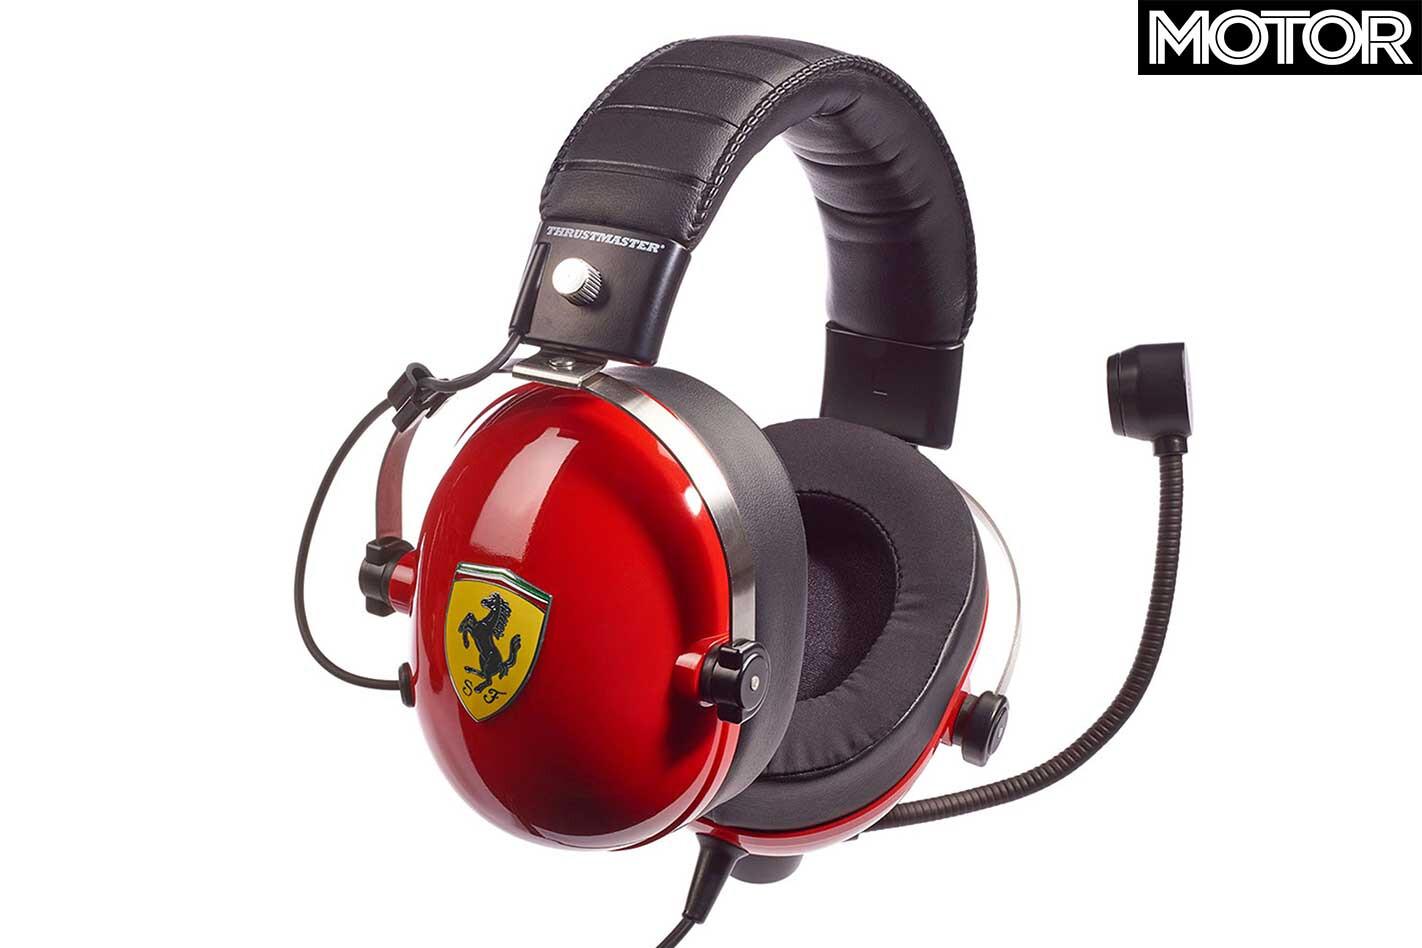 Cool Car Things We Want January 2019 Thrustmaster Ferrari Headset Jpg